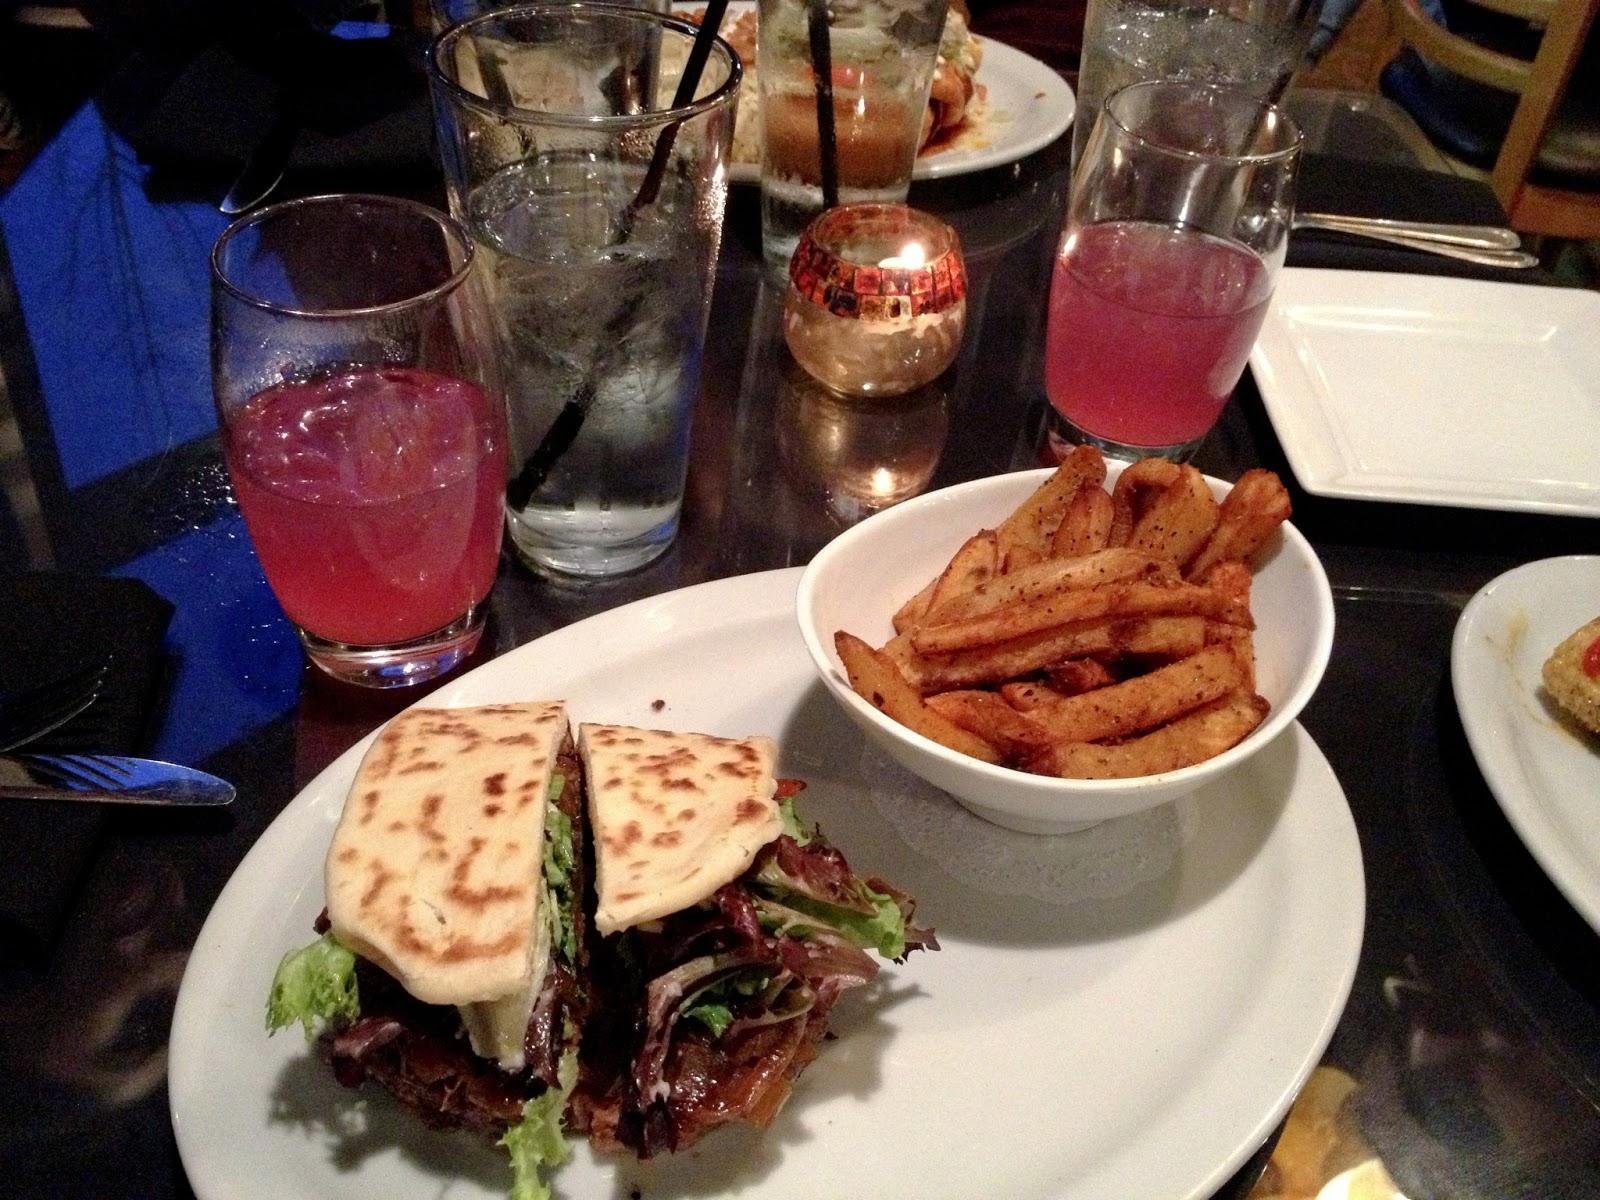 food blogger, food blog, food reviews, utah food reviews, black sheep cafe, gourmet food, cactus juice, cactus drink, sweet potato fries, sweet potato, cactus, blue cheese, blue cheese burger